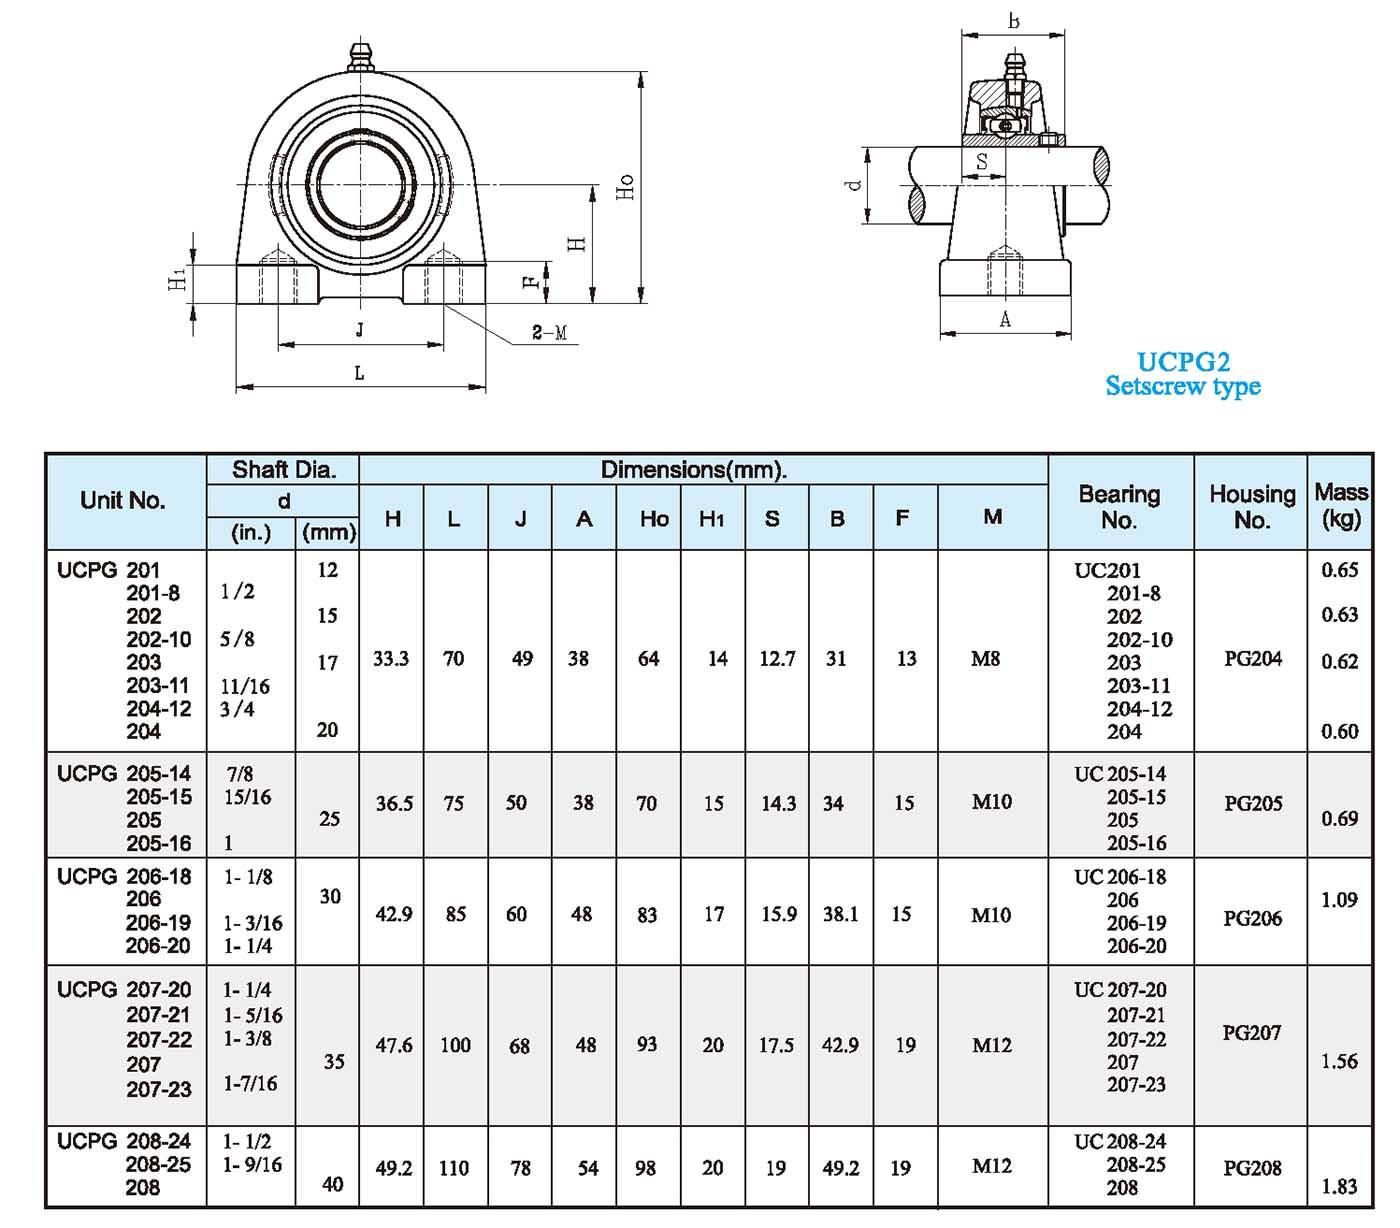 UCPG2 Setscrew type1